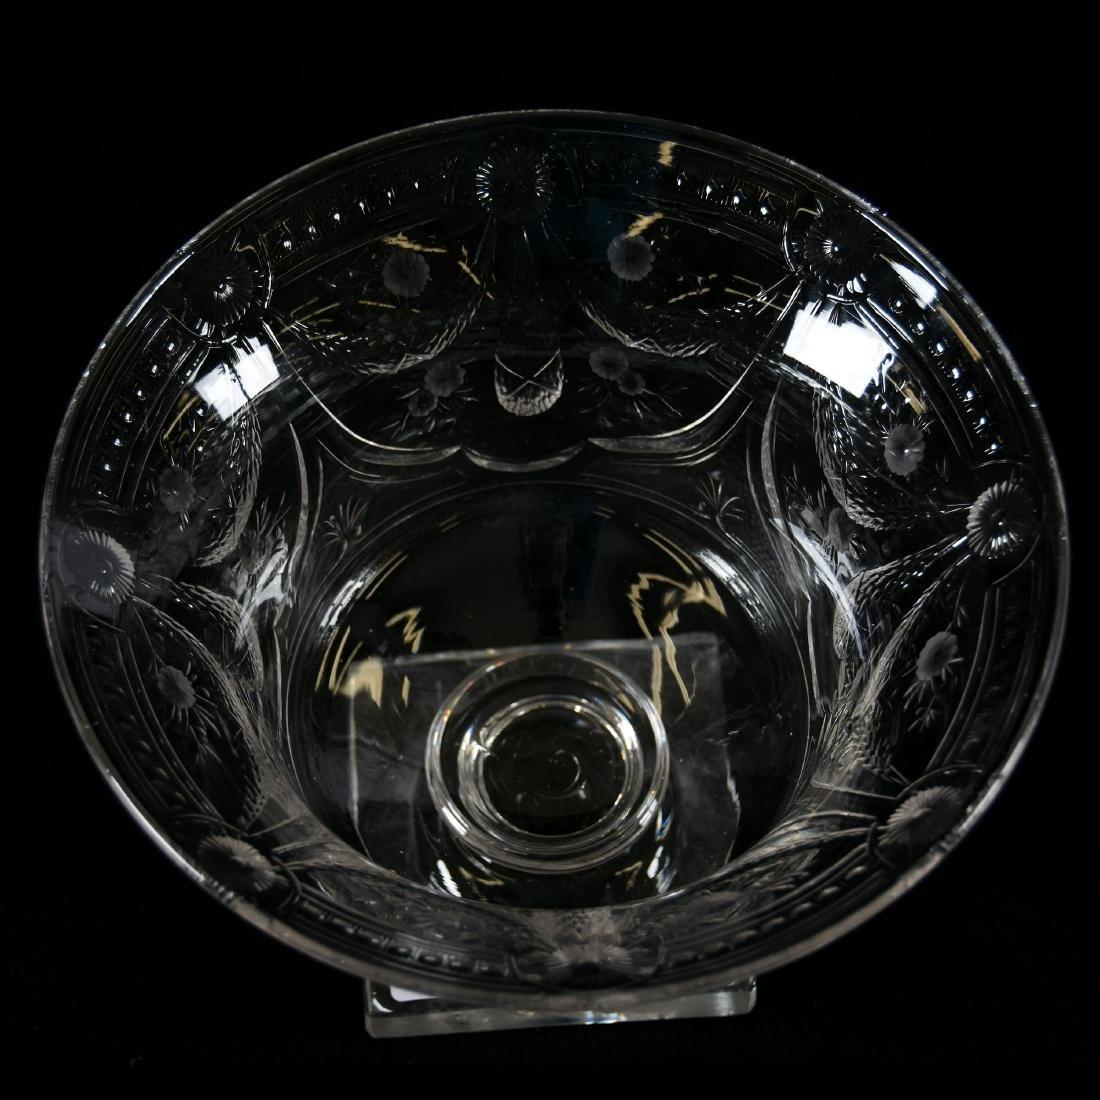 Pedestal Bowl, Engraved Garland & Floral Motif - 3